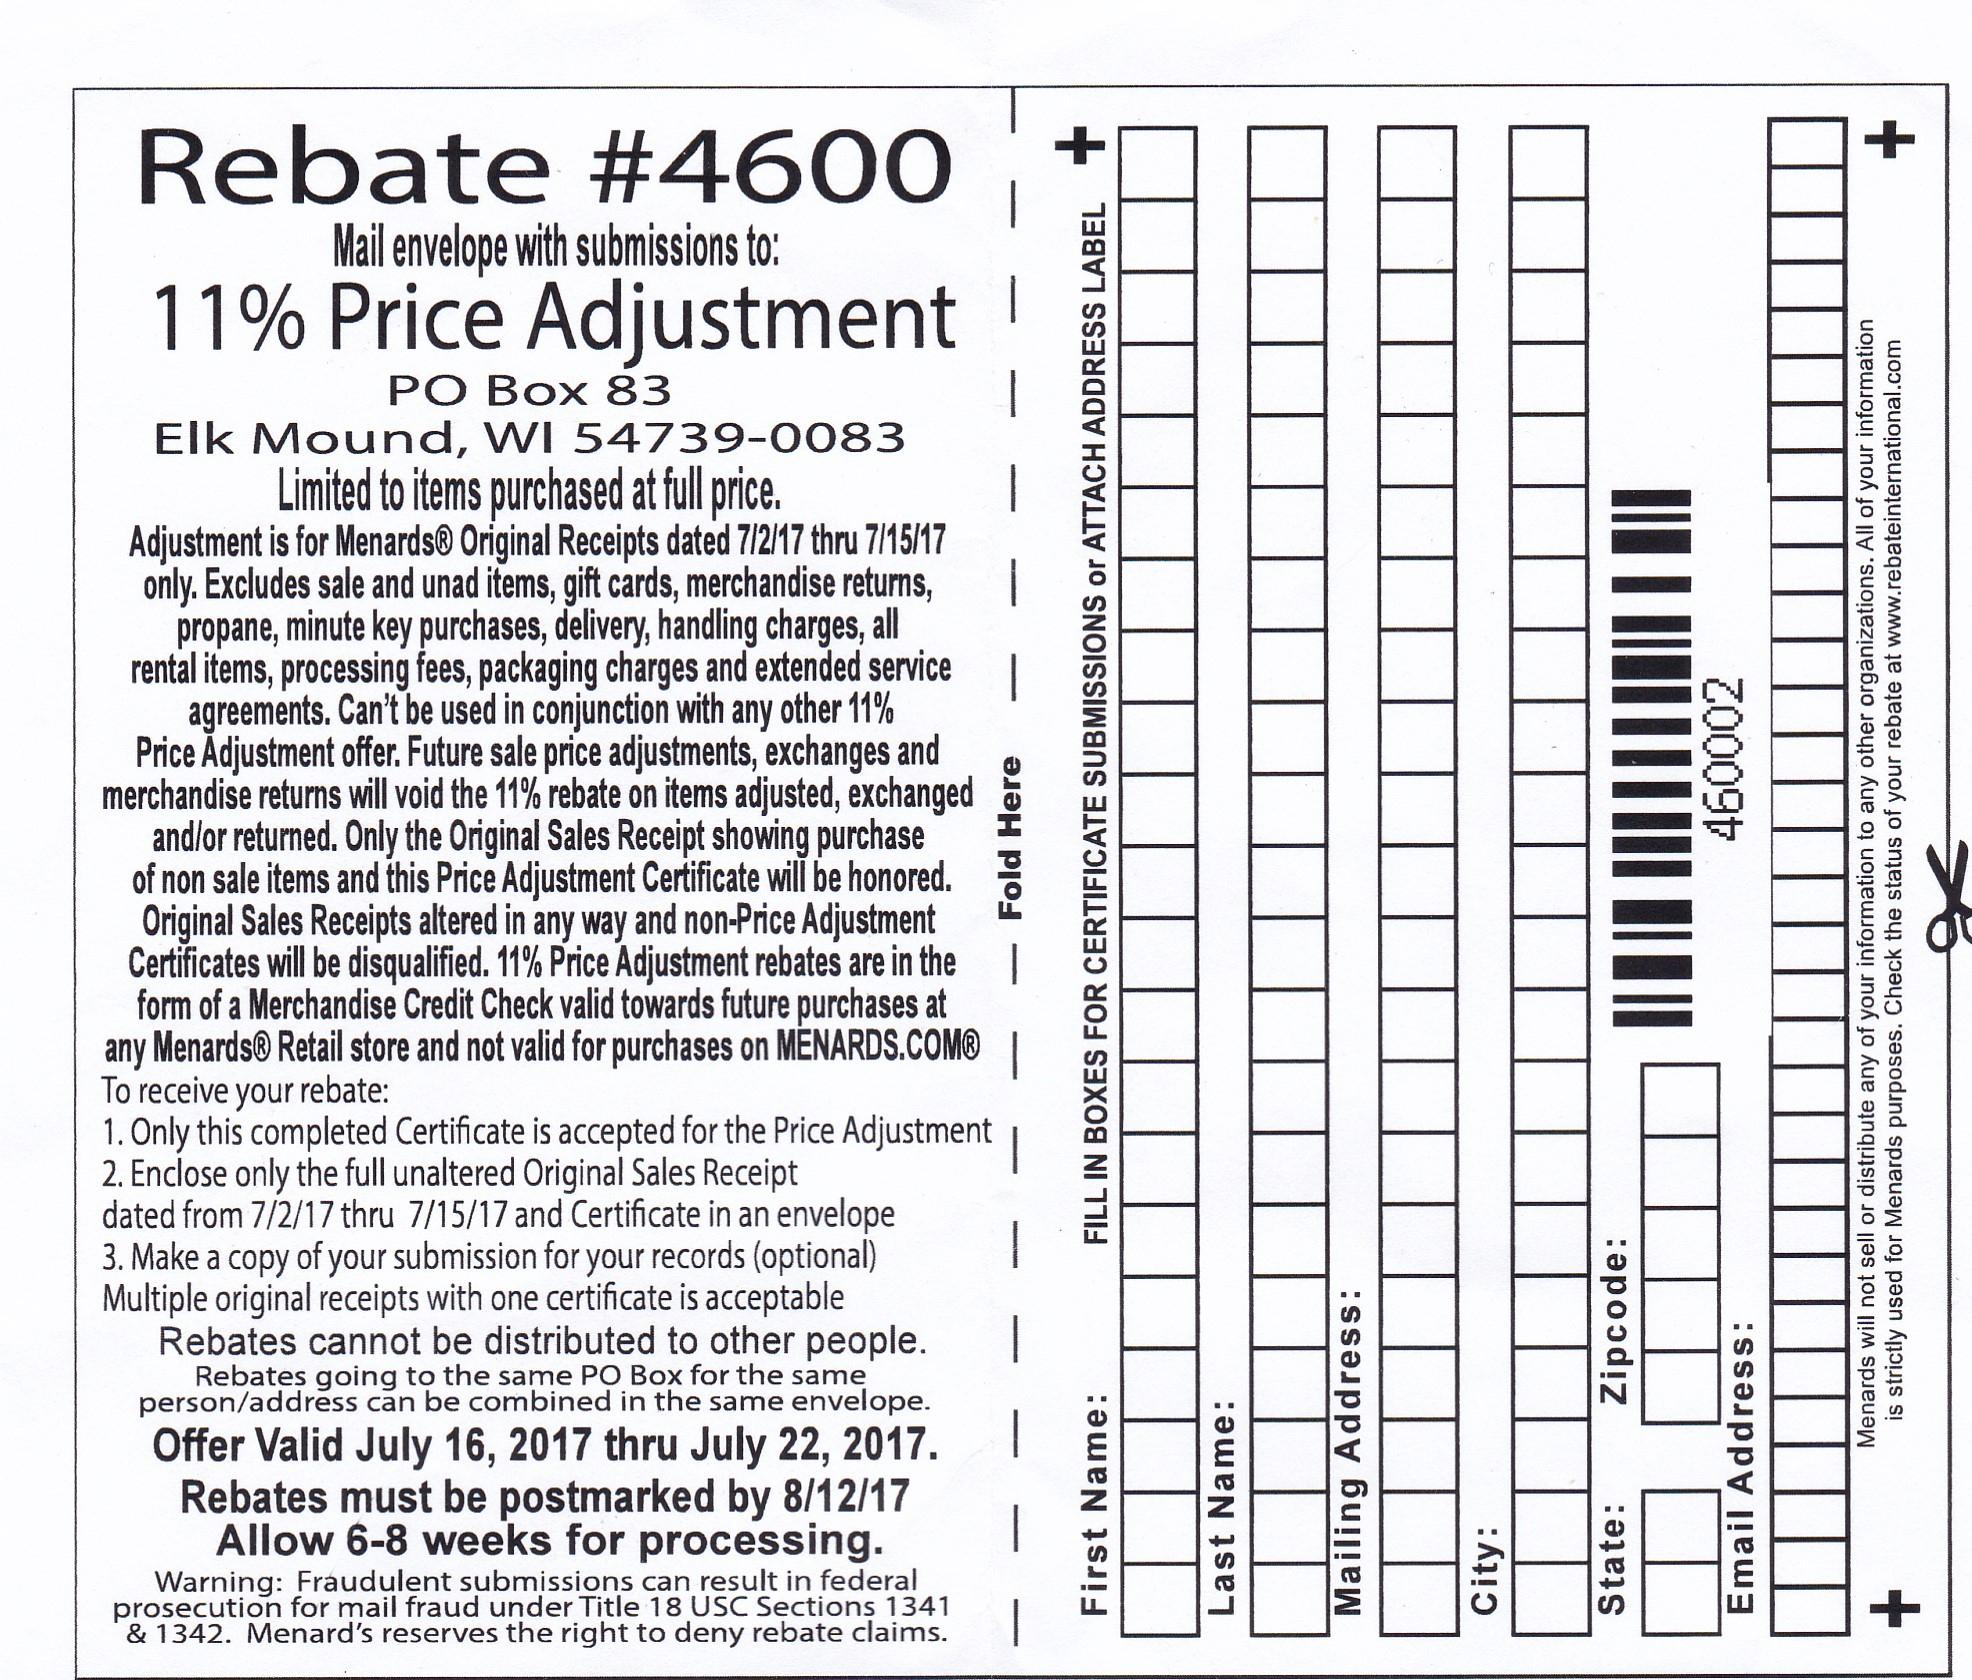 Menards Price Adjustment Rebate Form November 2021